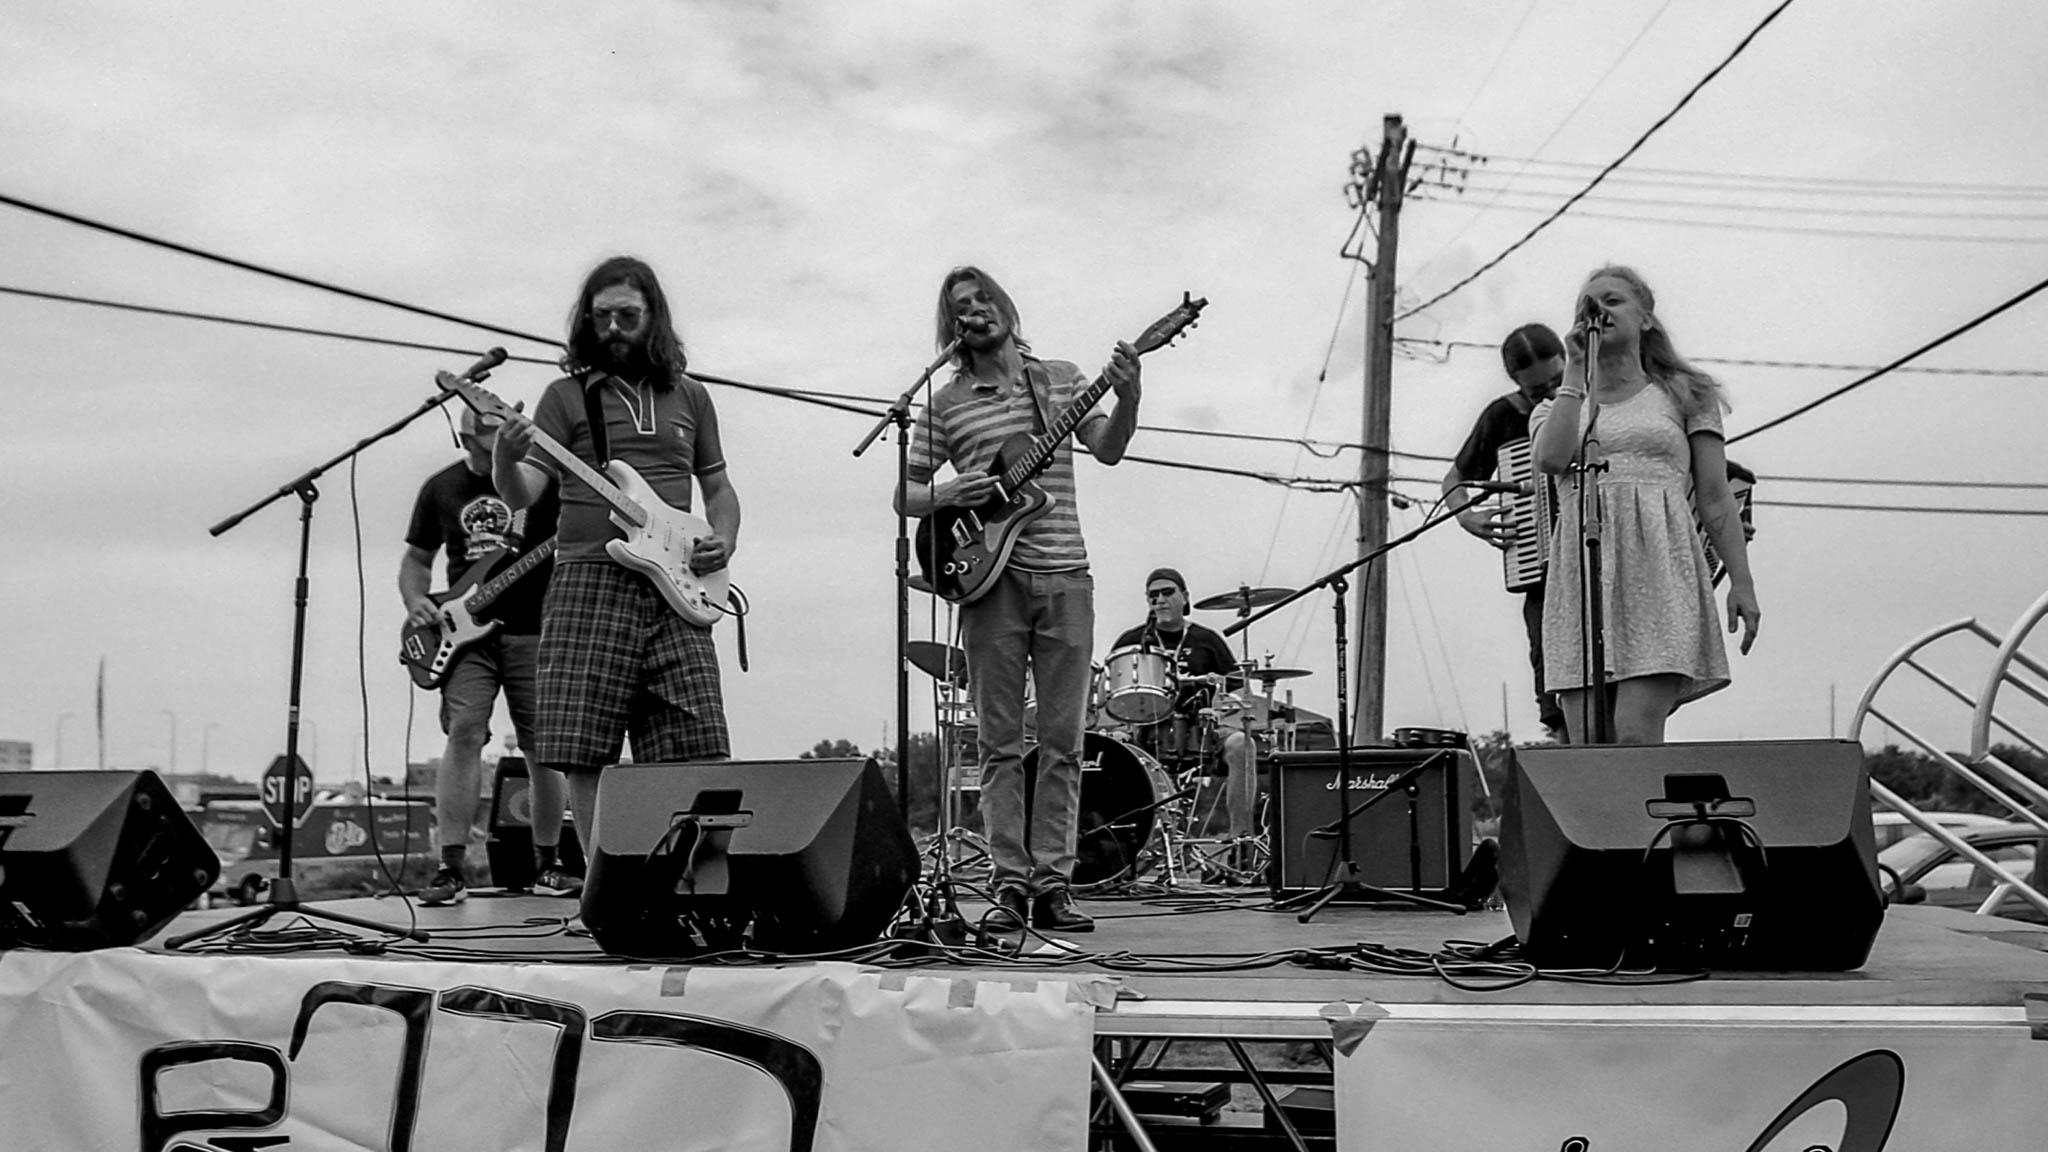 319 Fest 2018 in Cedar Rapids, Iowa